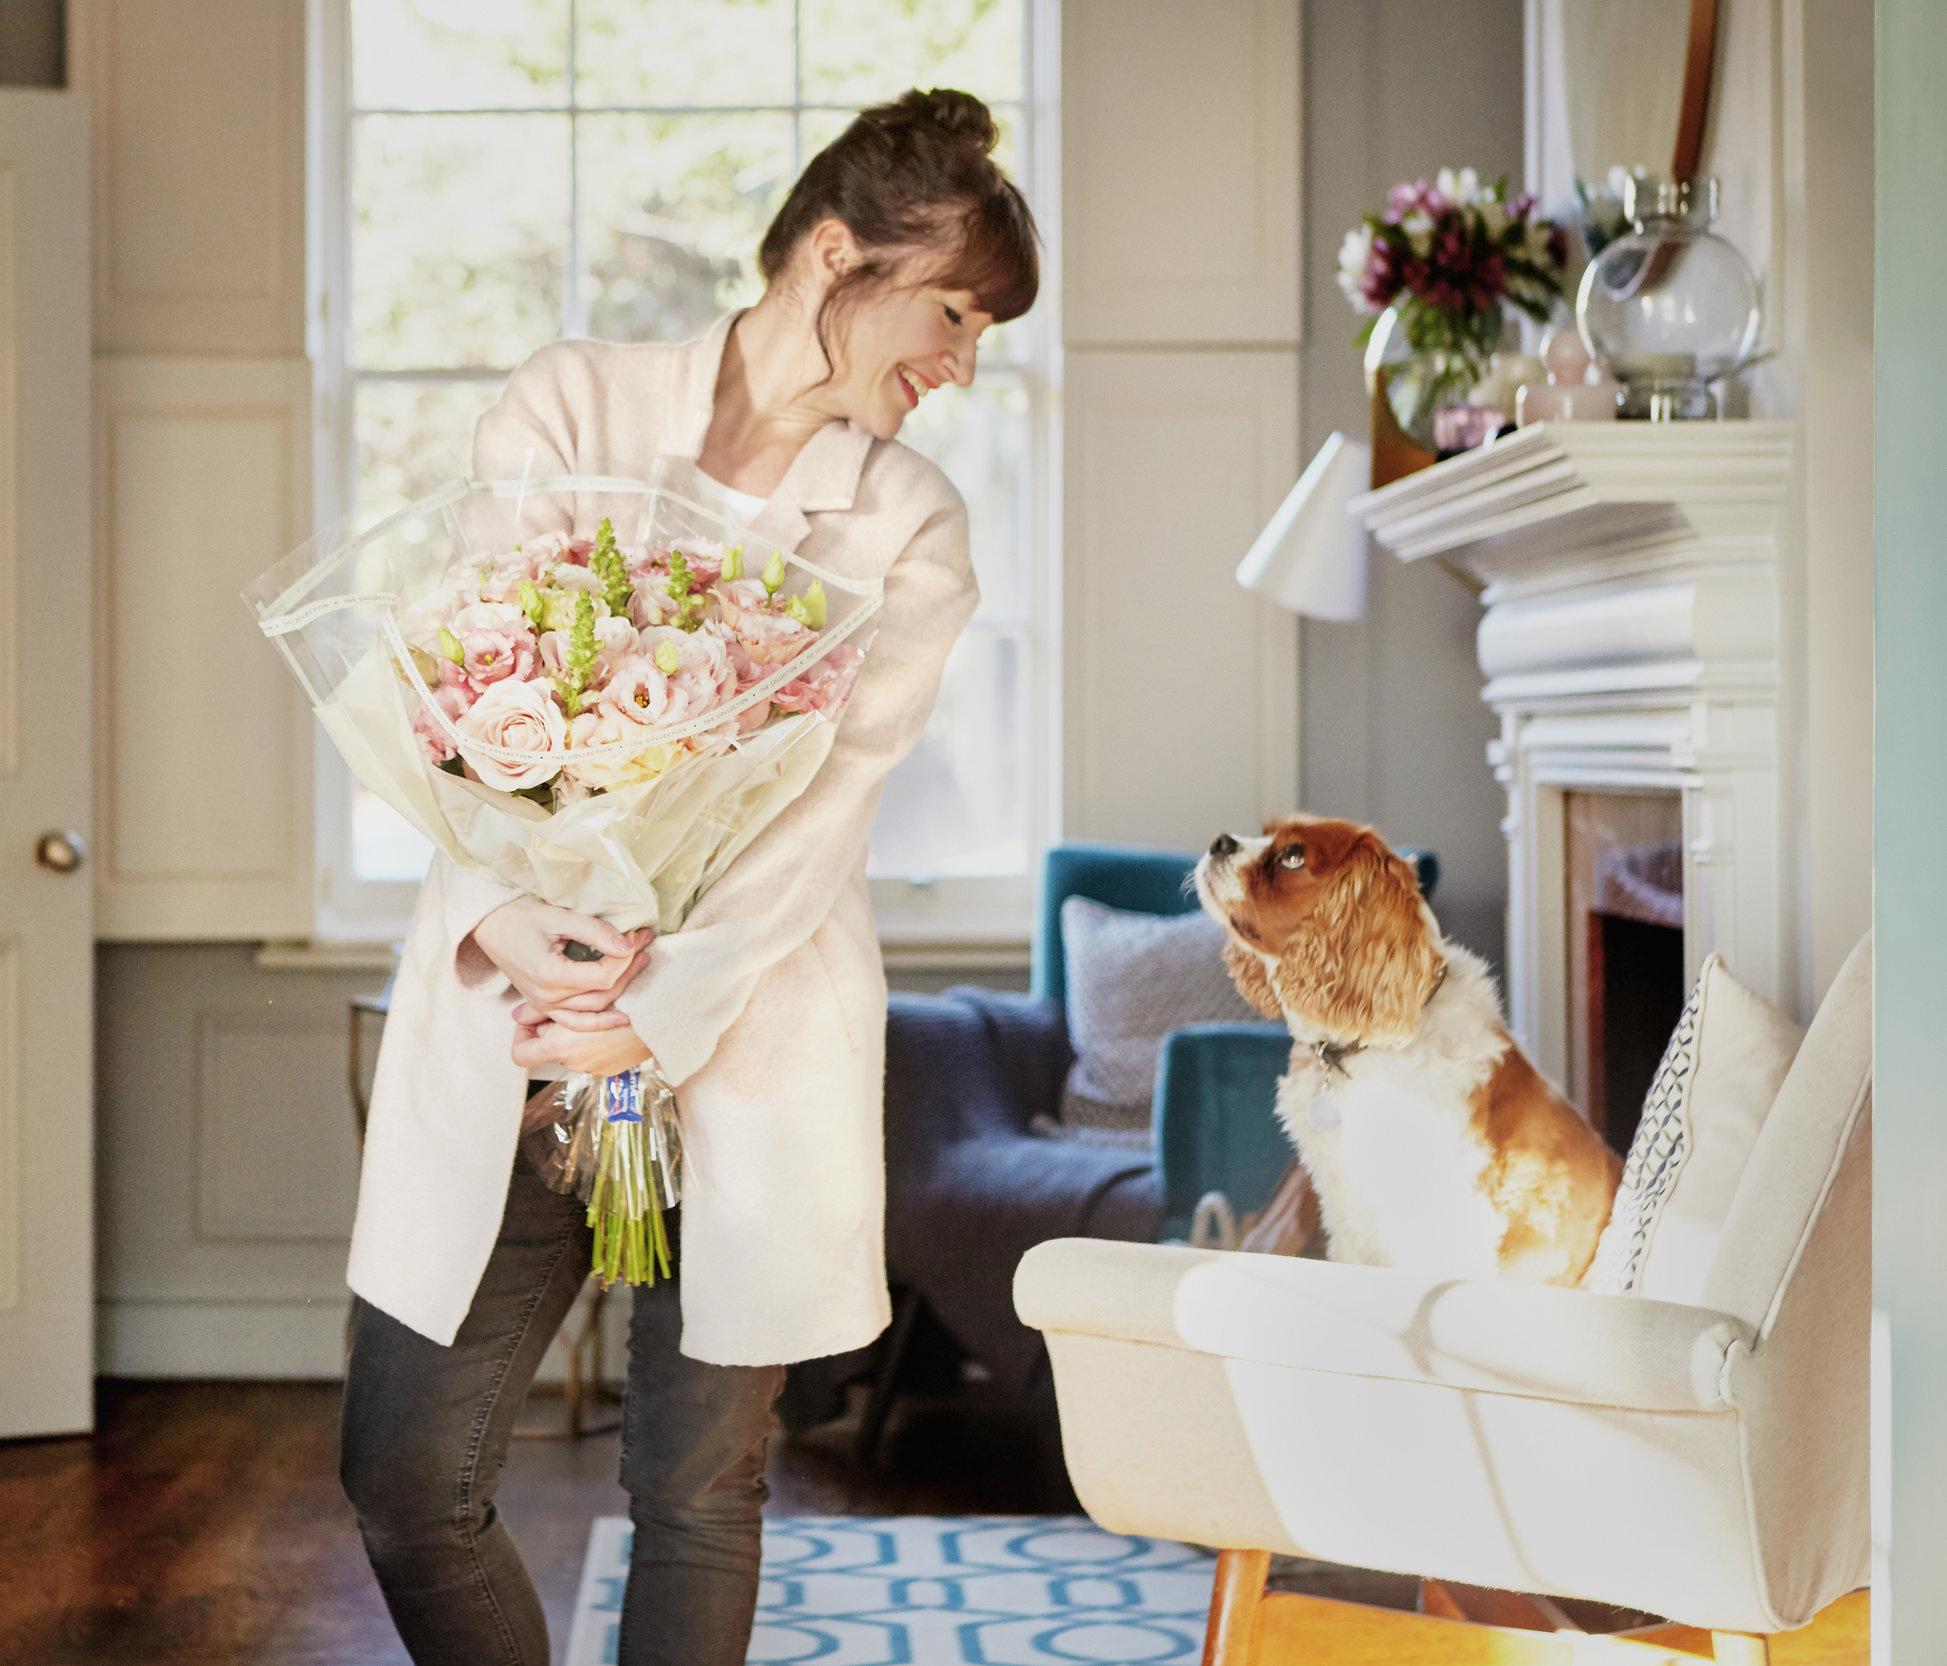 Melanie_Lissack_M%26S_Flowers_014_Review.jpg